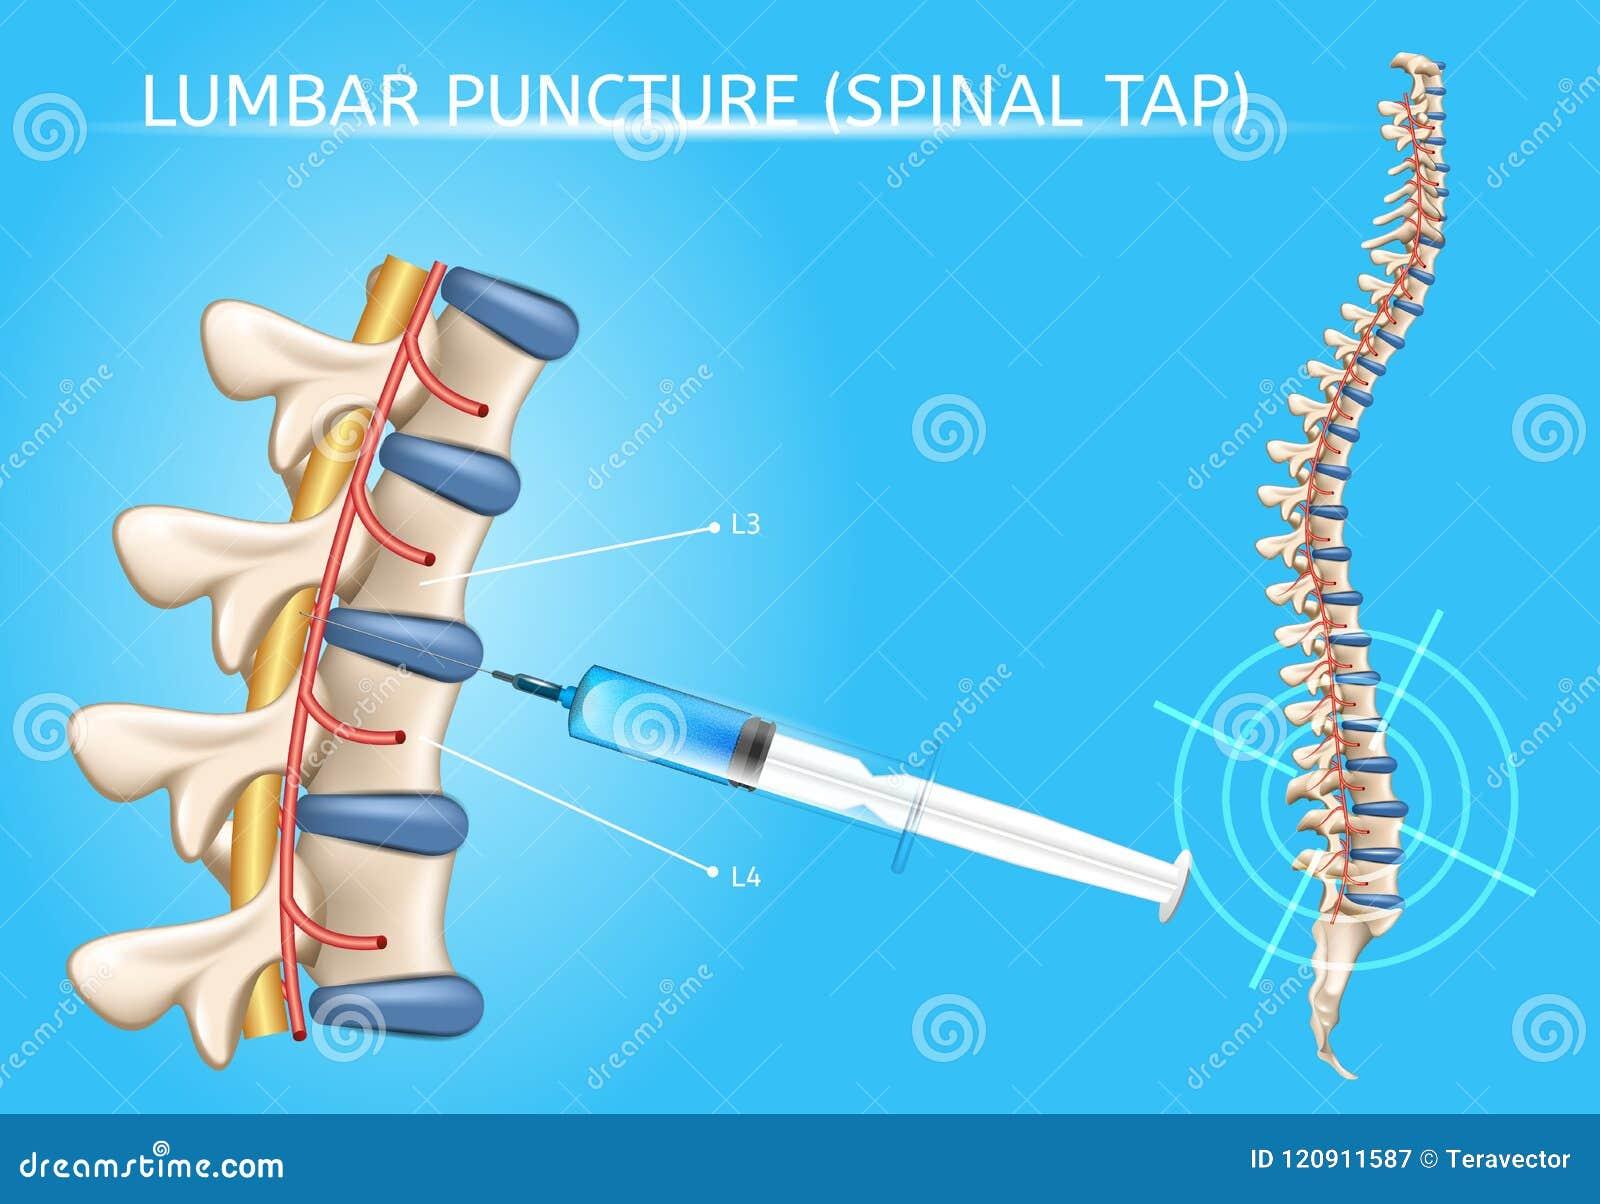 Lumbar Puncture Realistic Vector Medical Scheme Stock Vector ...